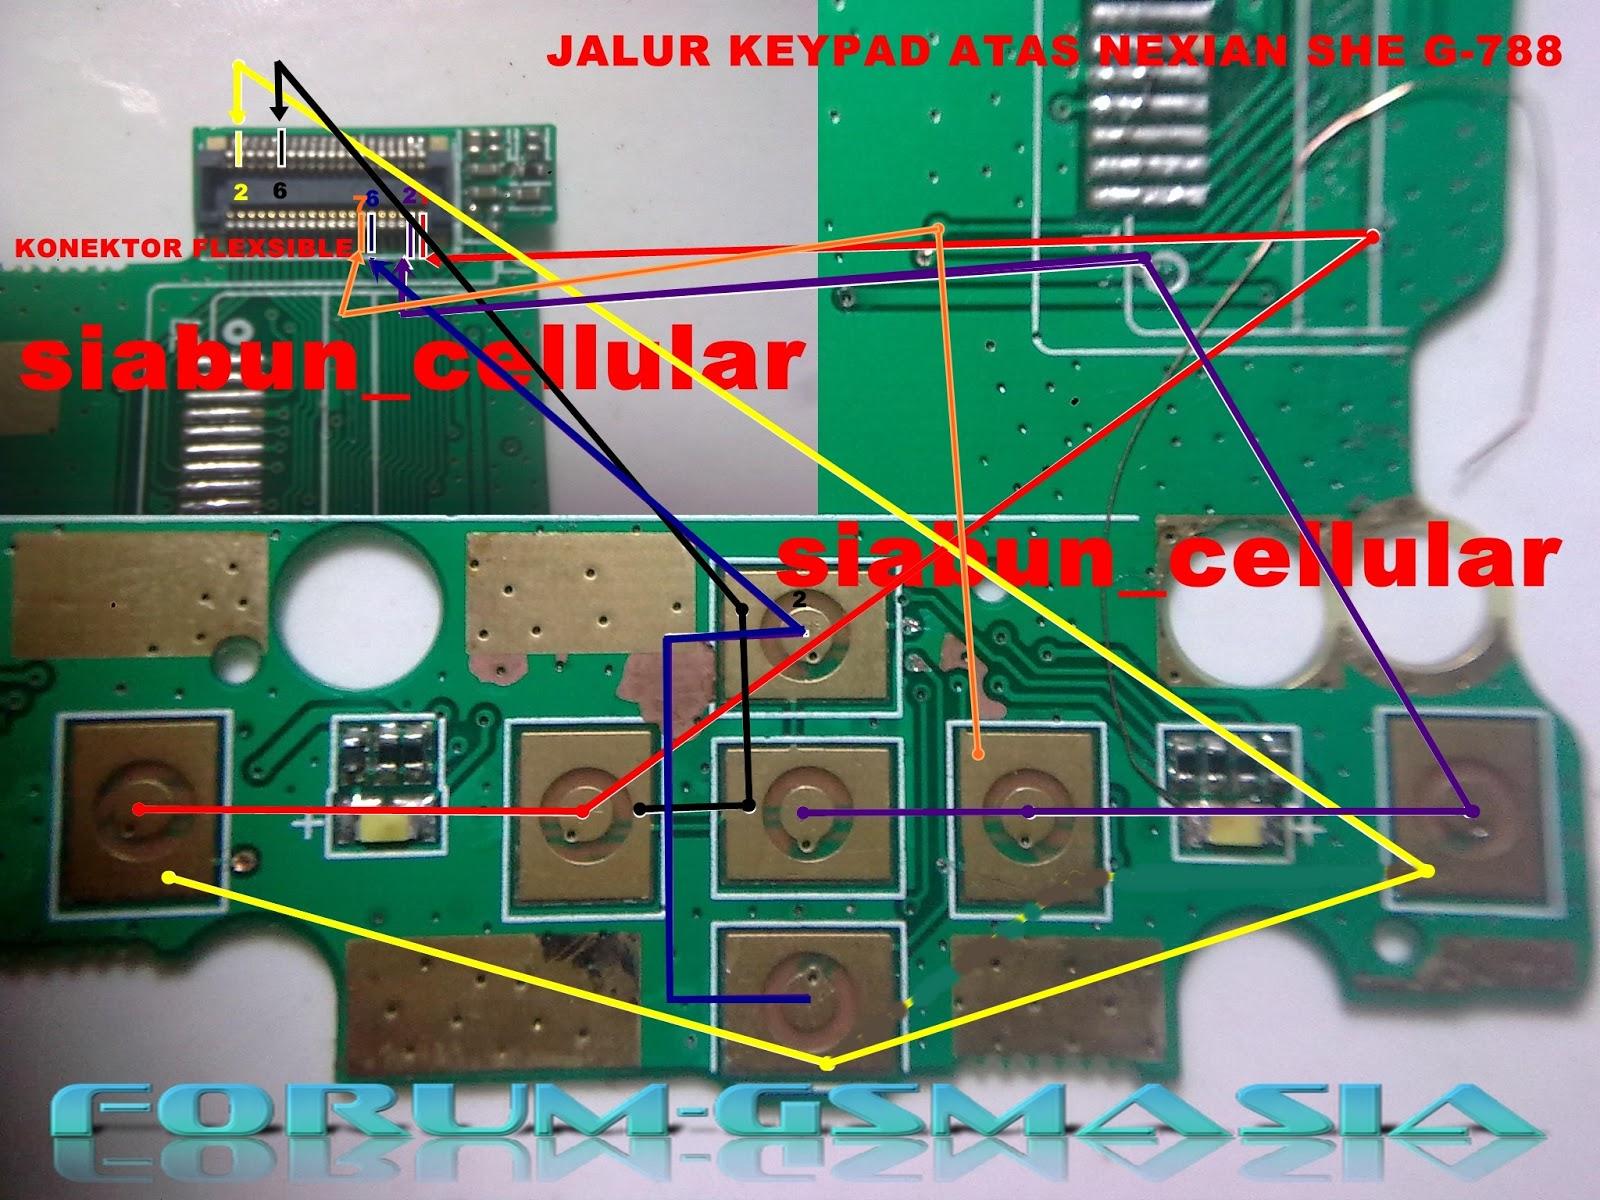 Solusi All Service Hp China Komunicacell Nexcom Mars Jumper Keypad Nexian She G 788 Putustrik